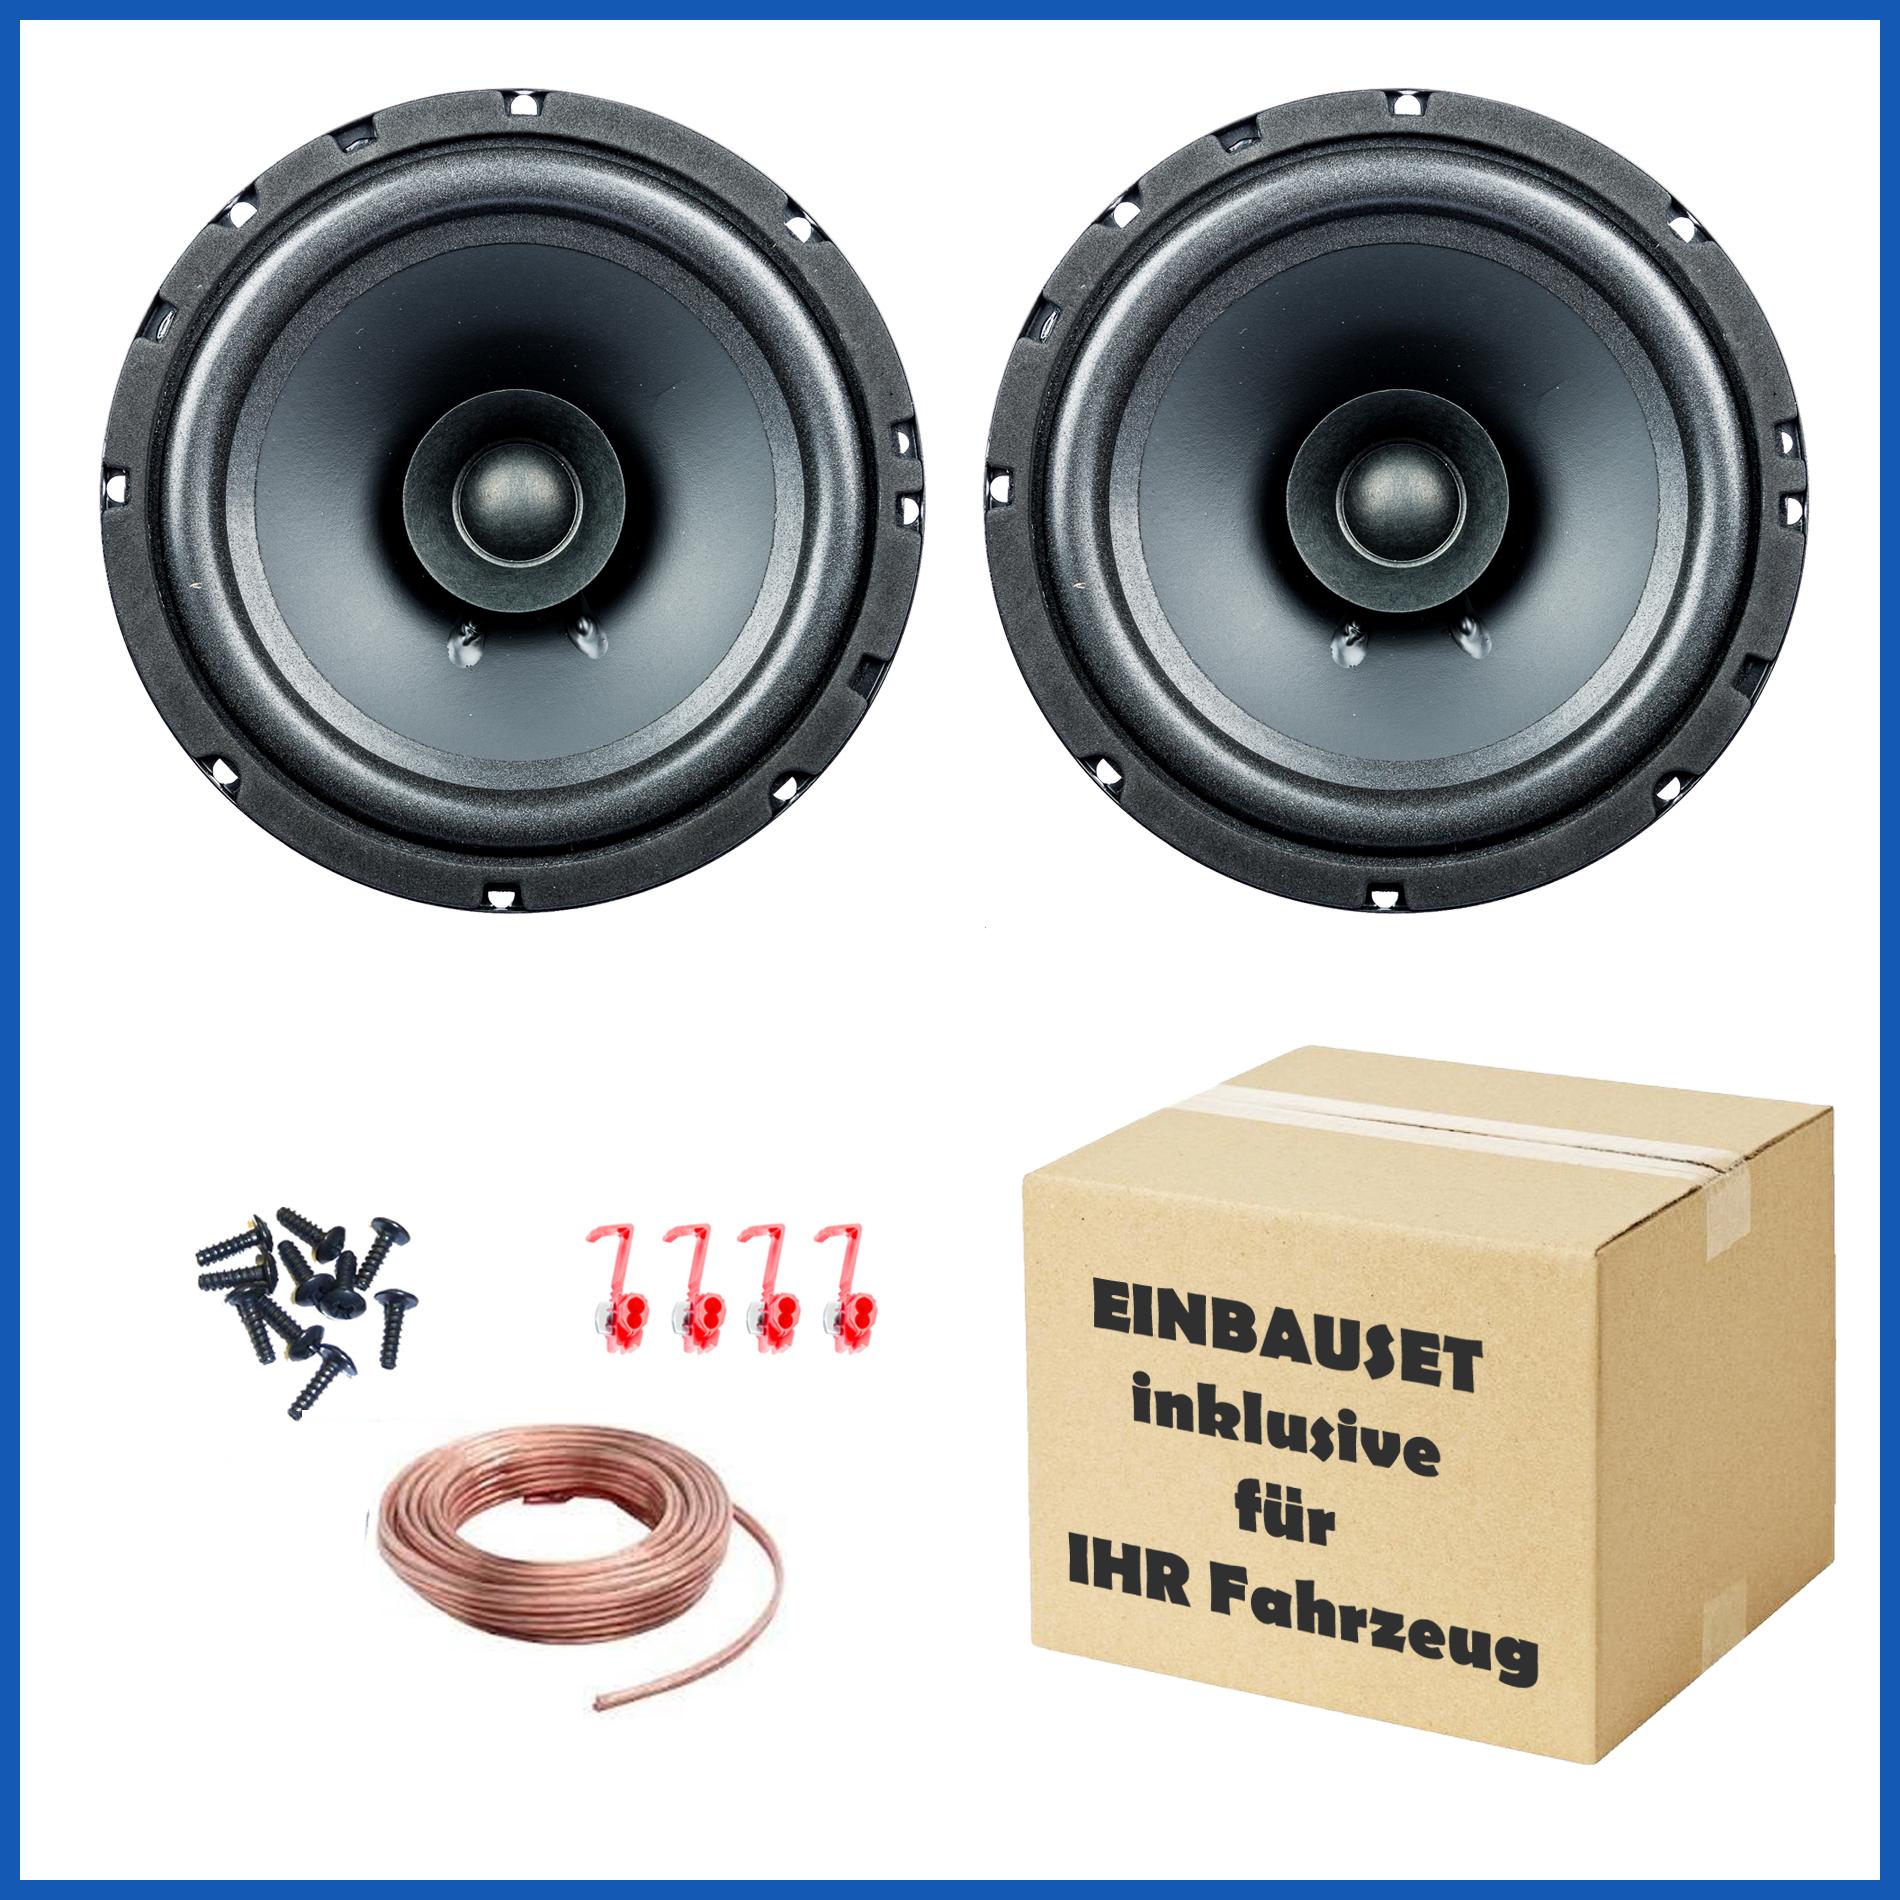 1 Paar PG Audio EVO I 16.2, 16 cm Dual Cone Lautsprecher für Alfa,Fiat,Lancia & Chrysler – Bild 1